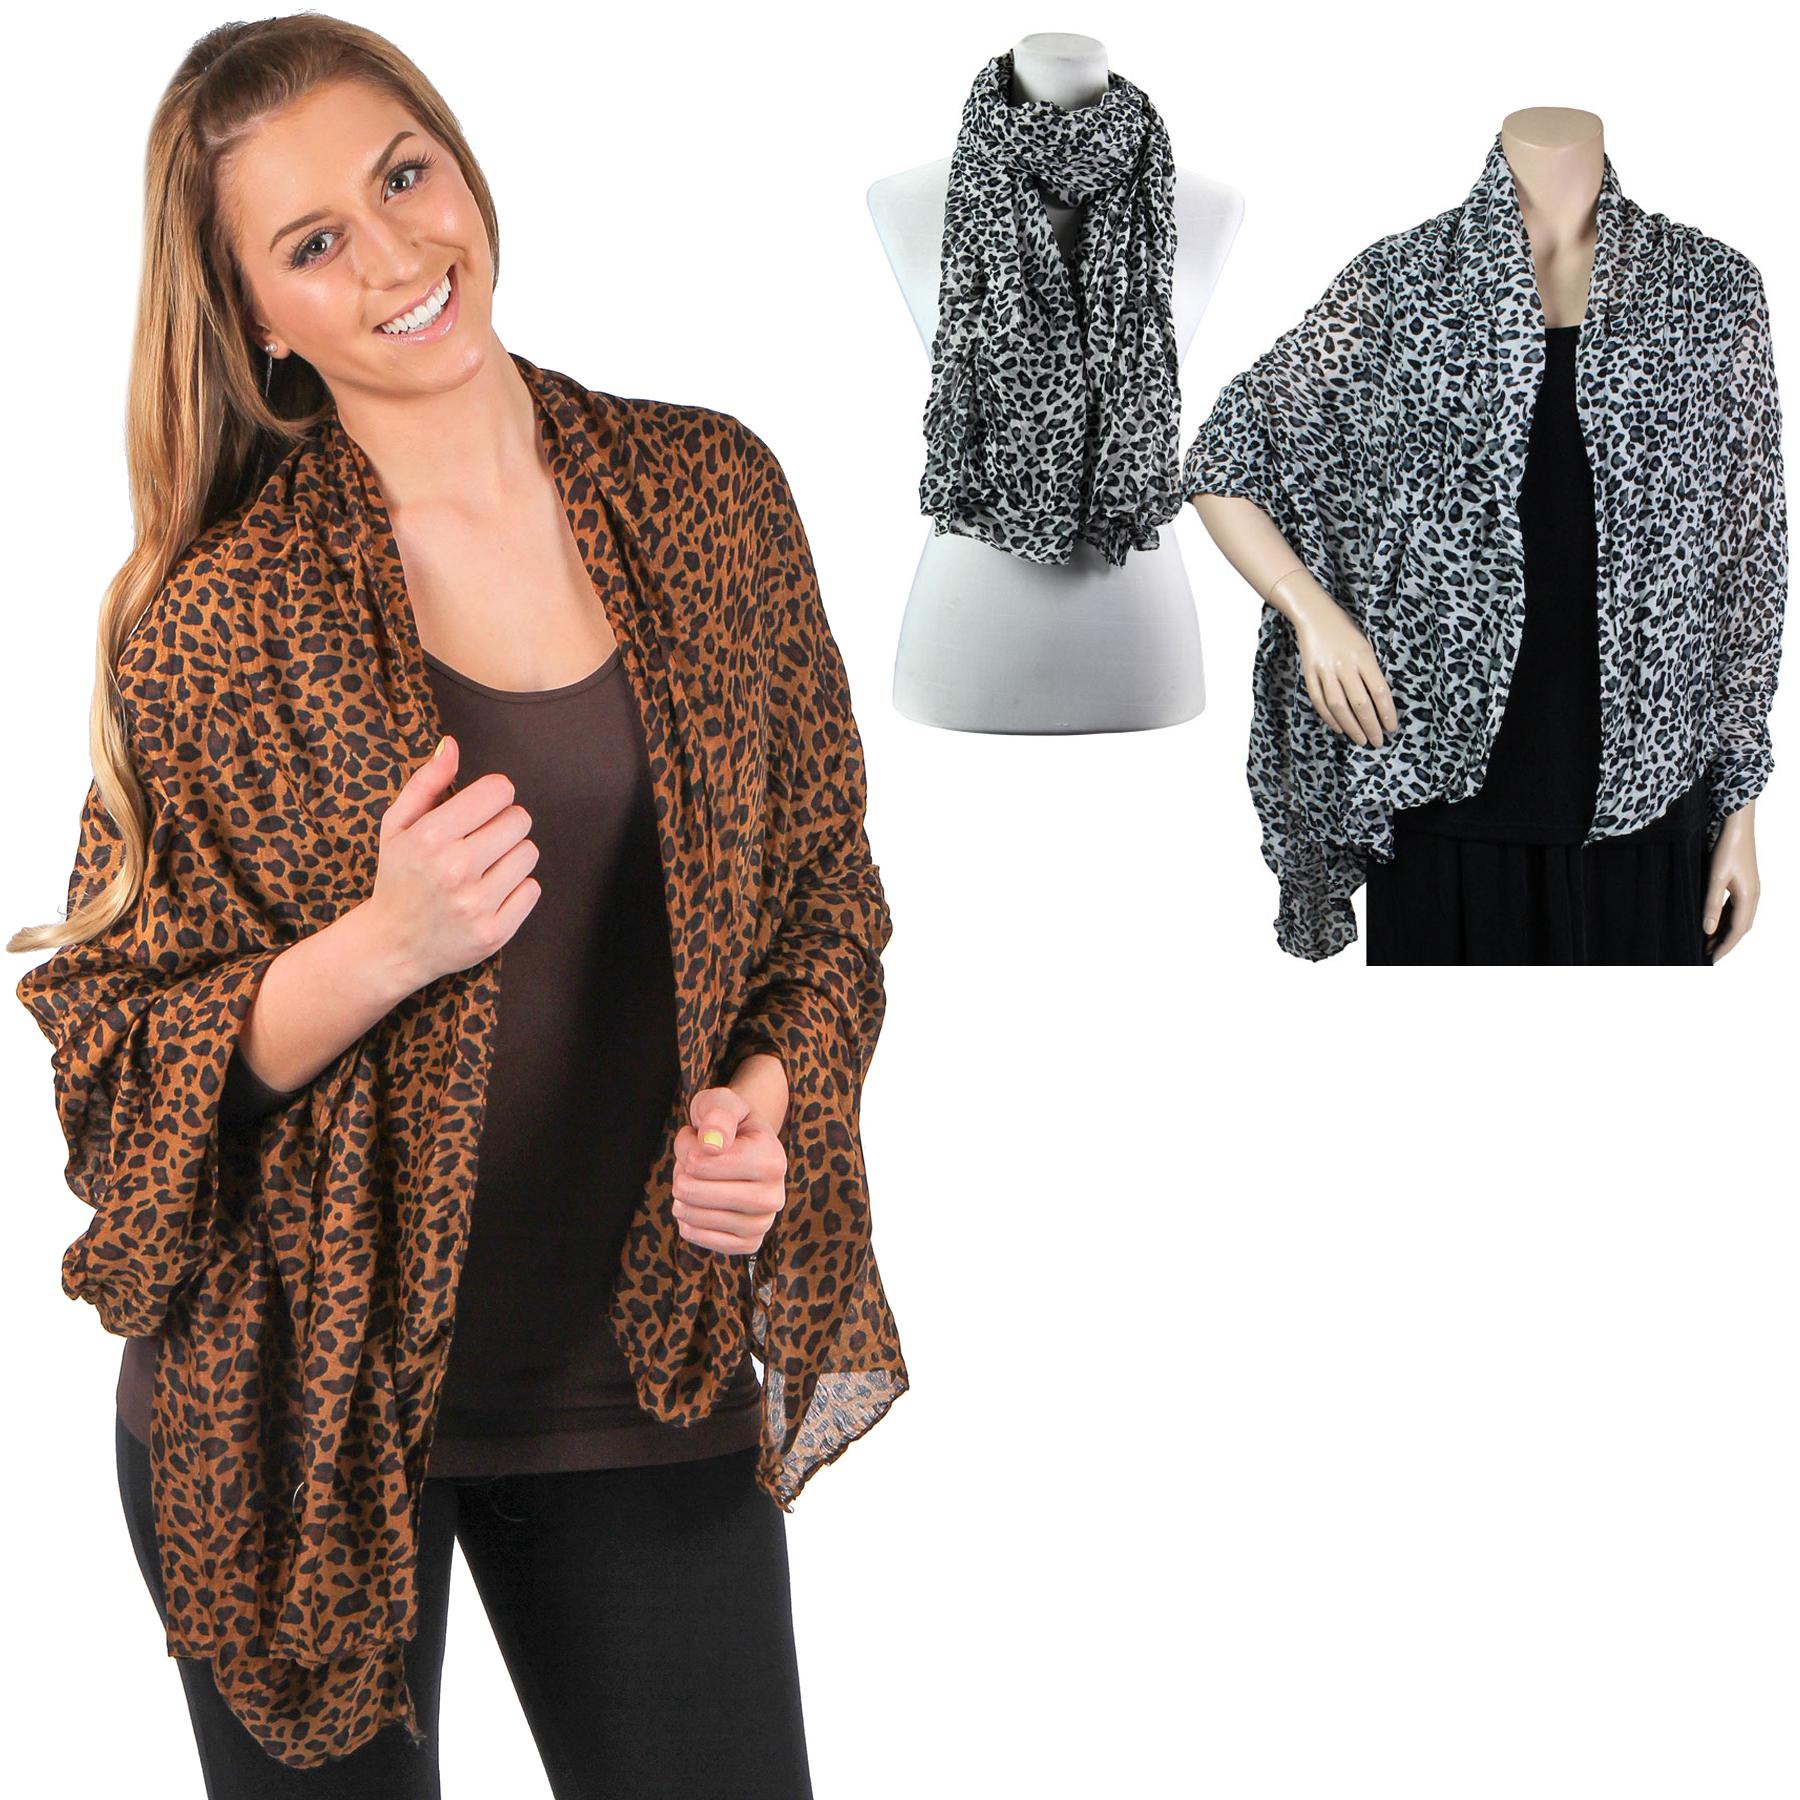 Big Scarves/Shawls - Leopard Print 4123*